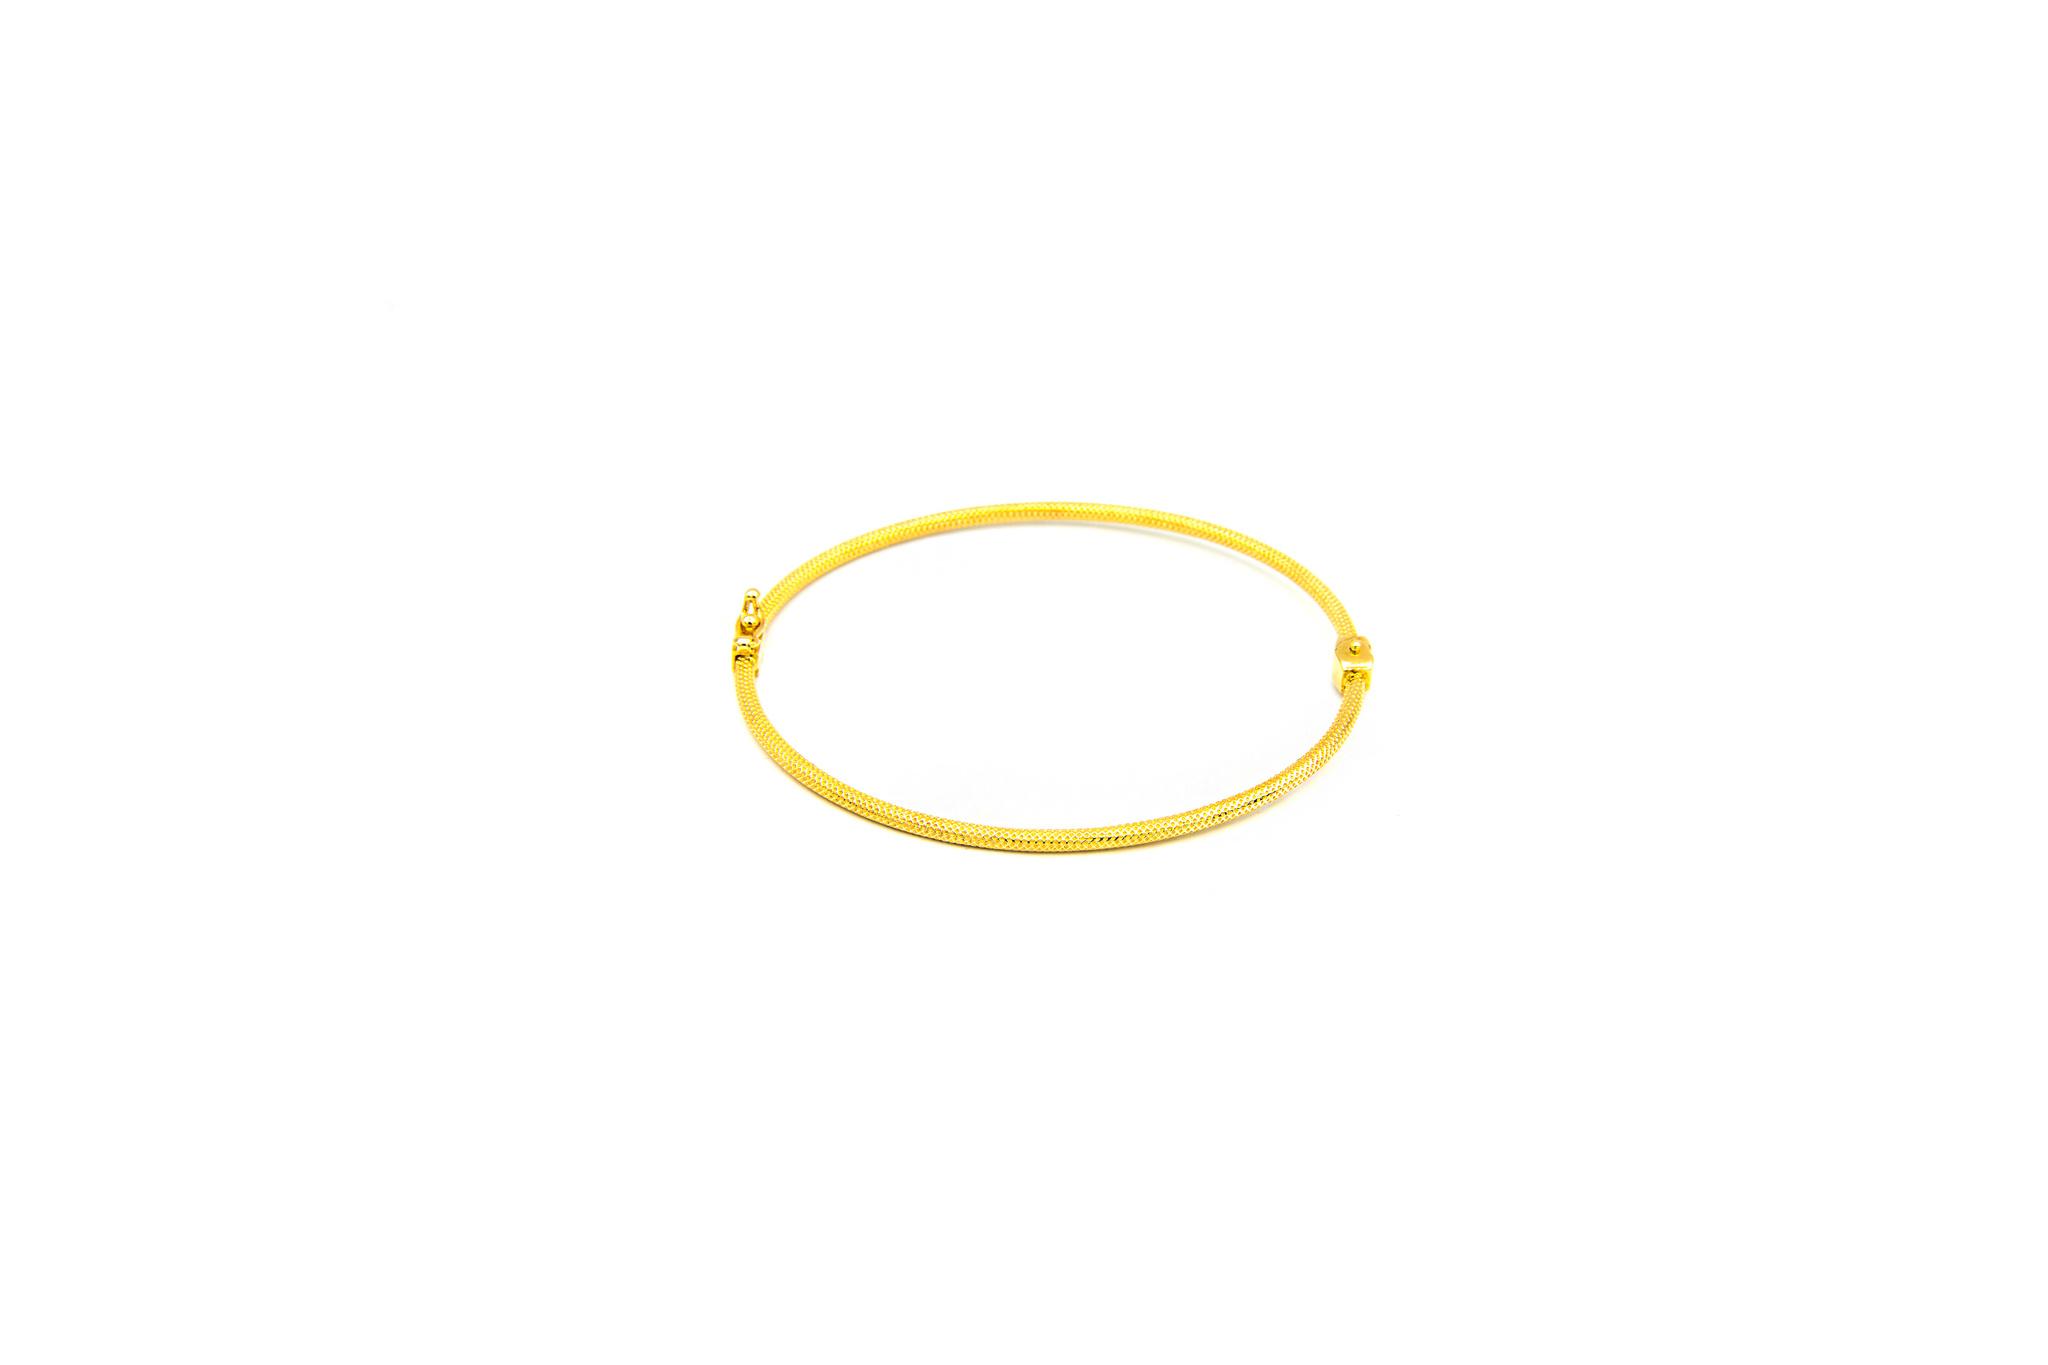 Armband vast bewerkt-4